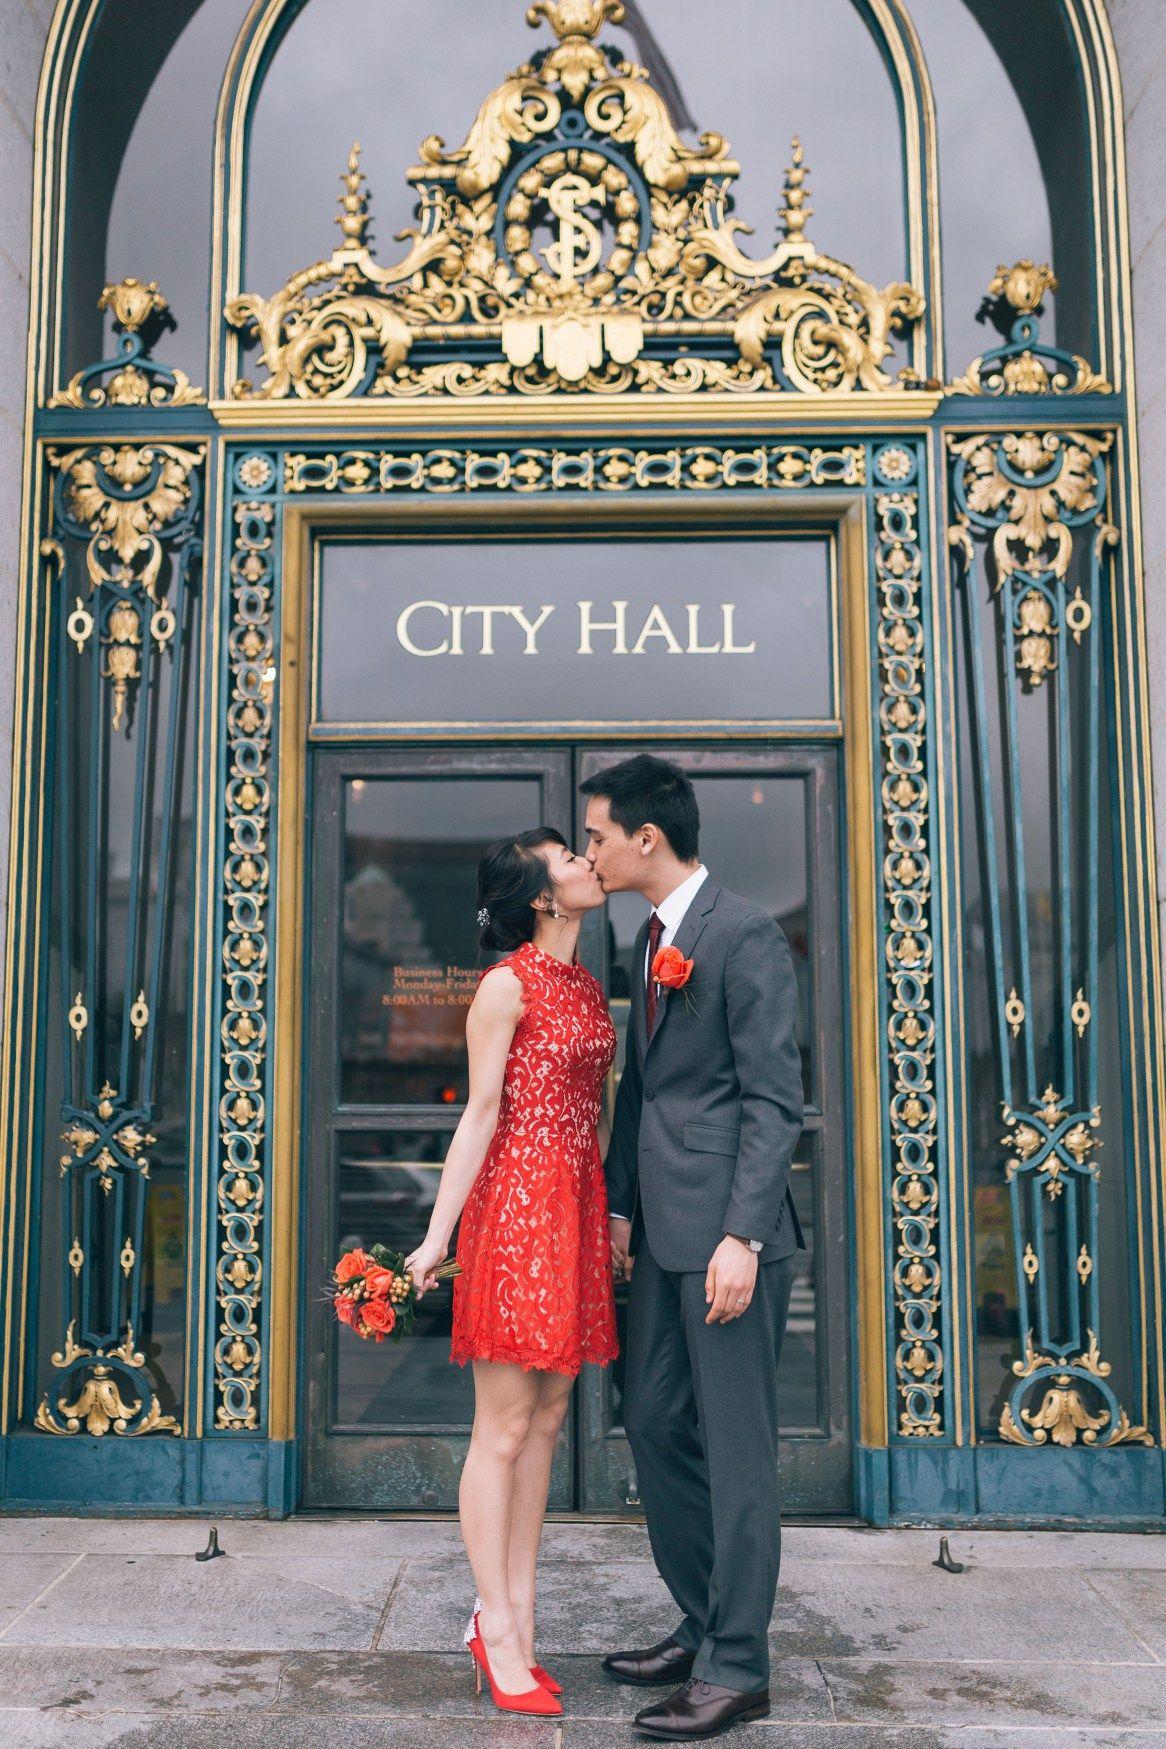 La vie en rouge at city hall andre karen city hall